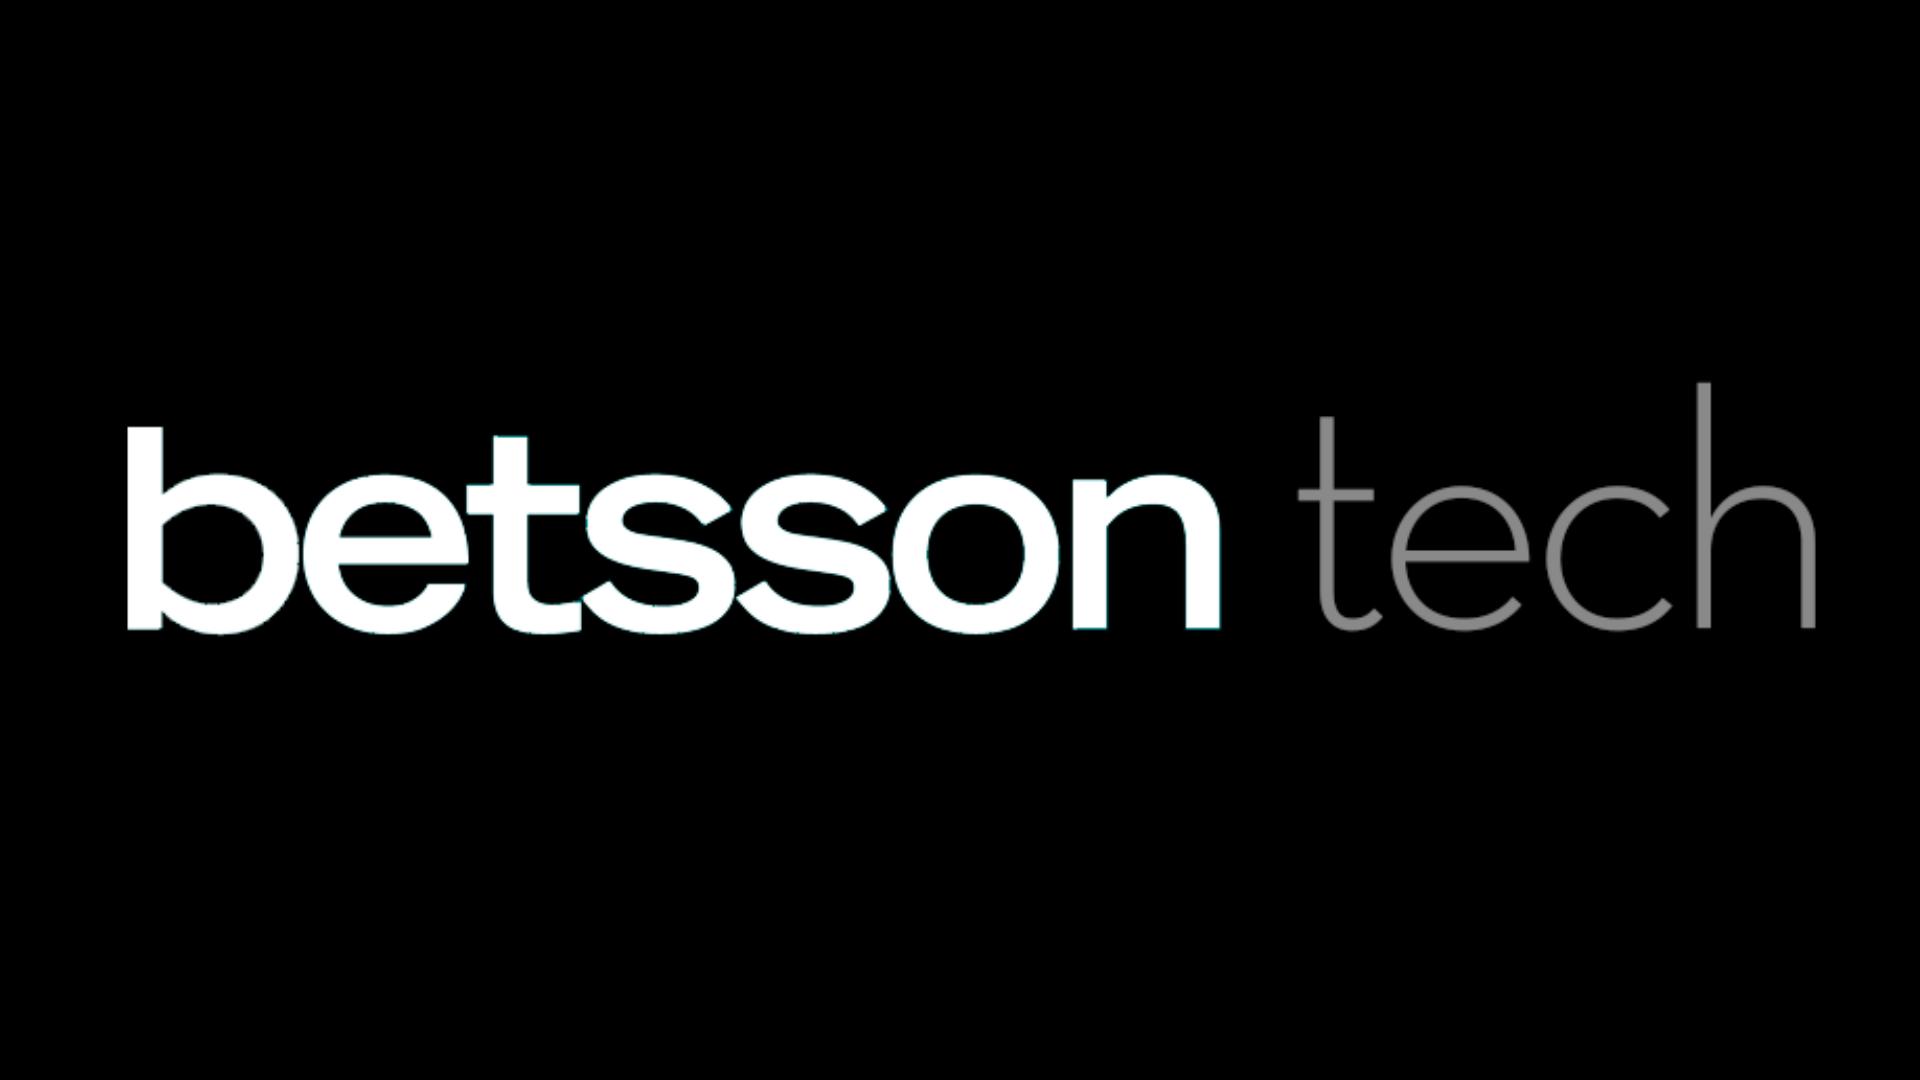 betsson technologies